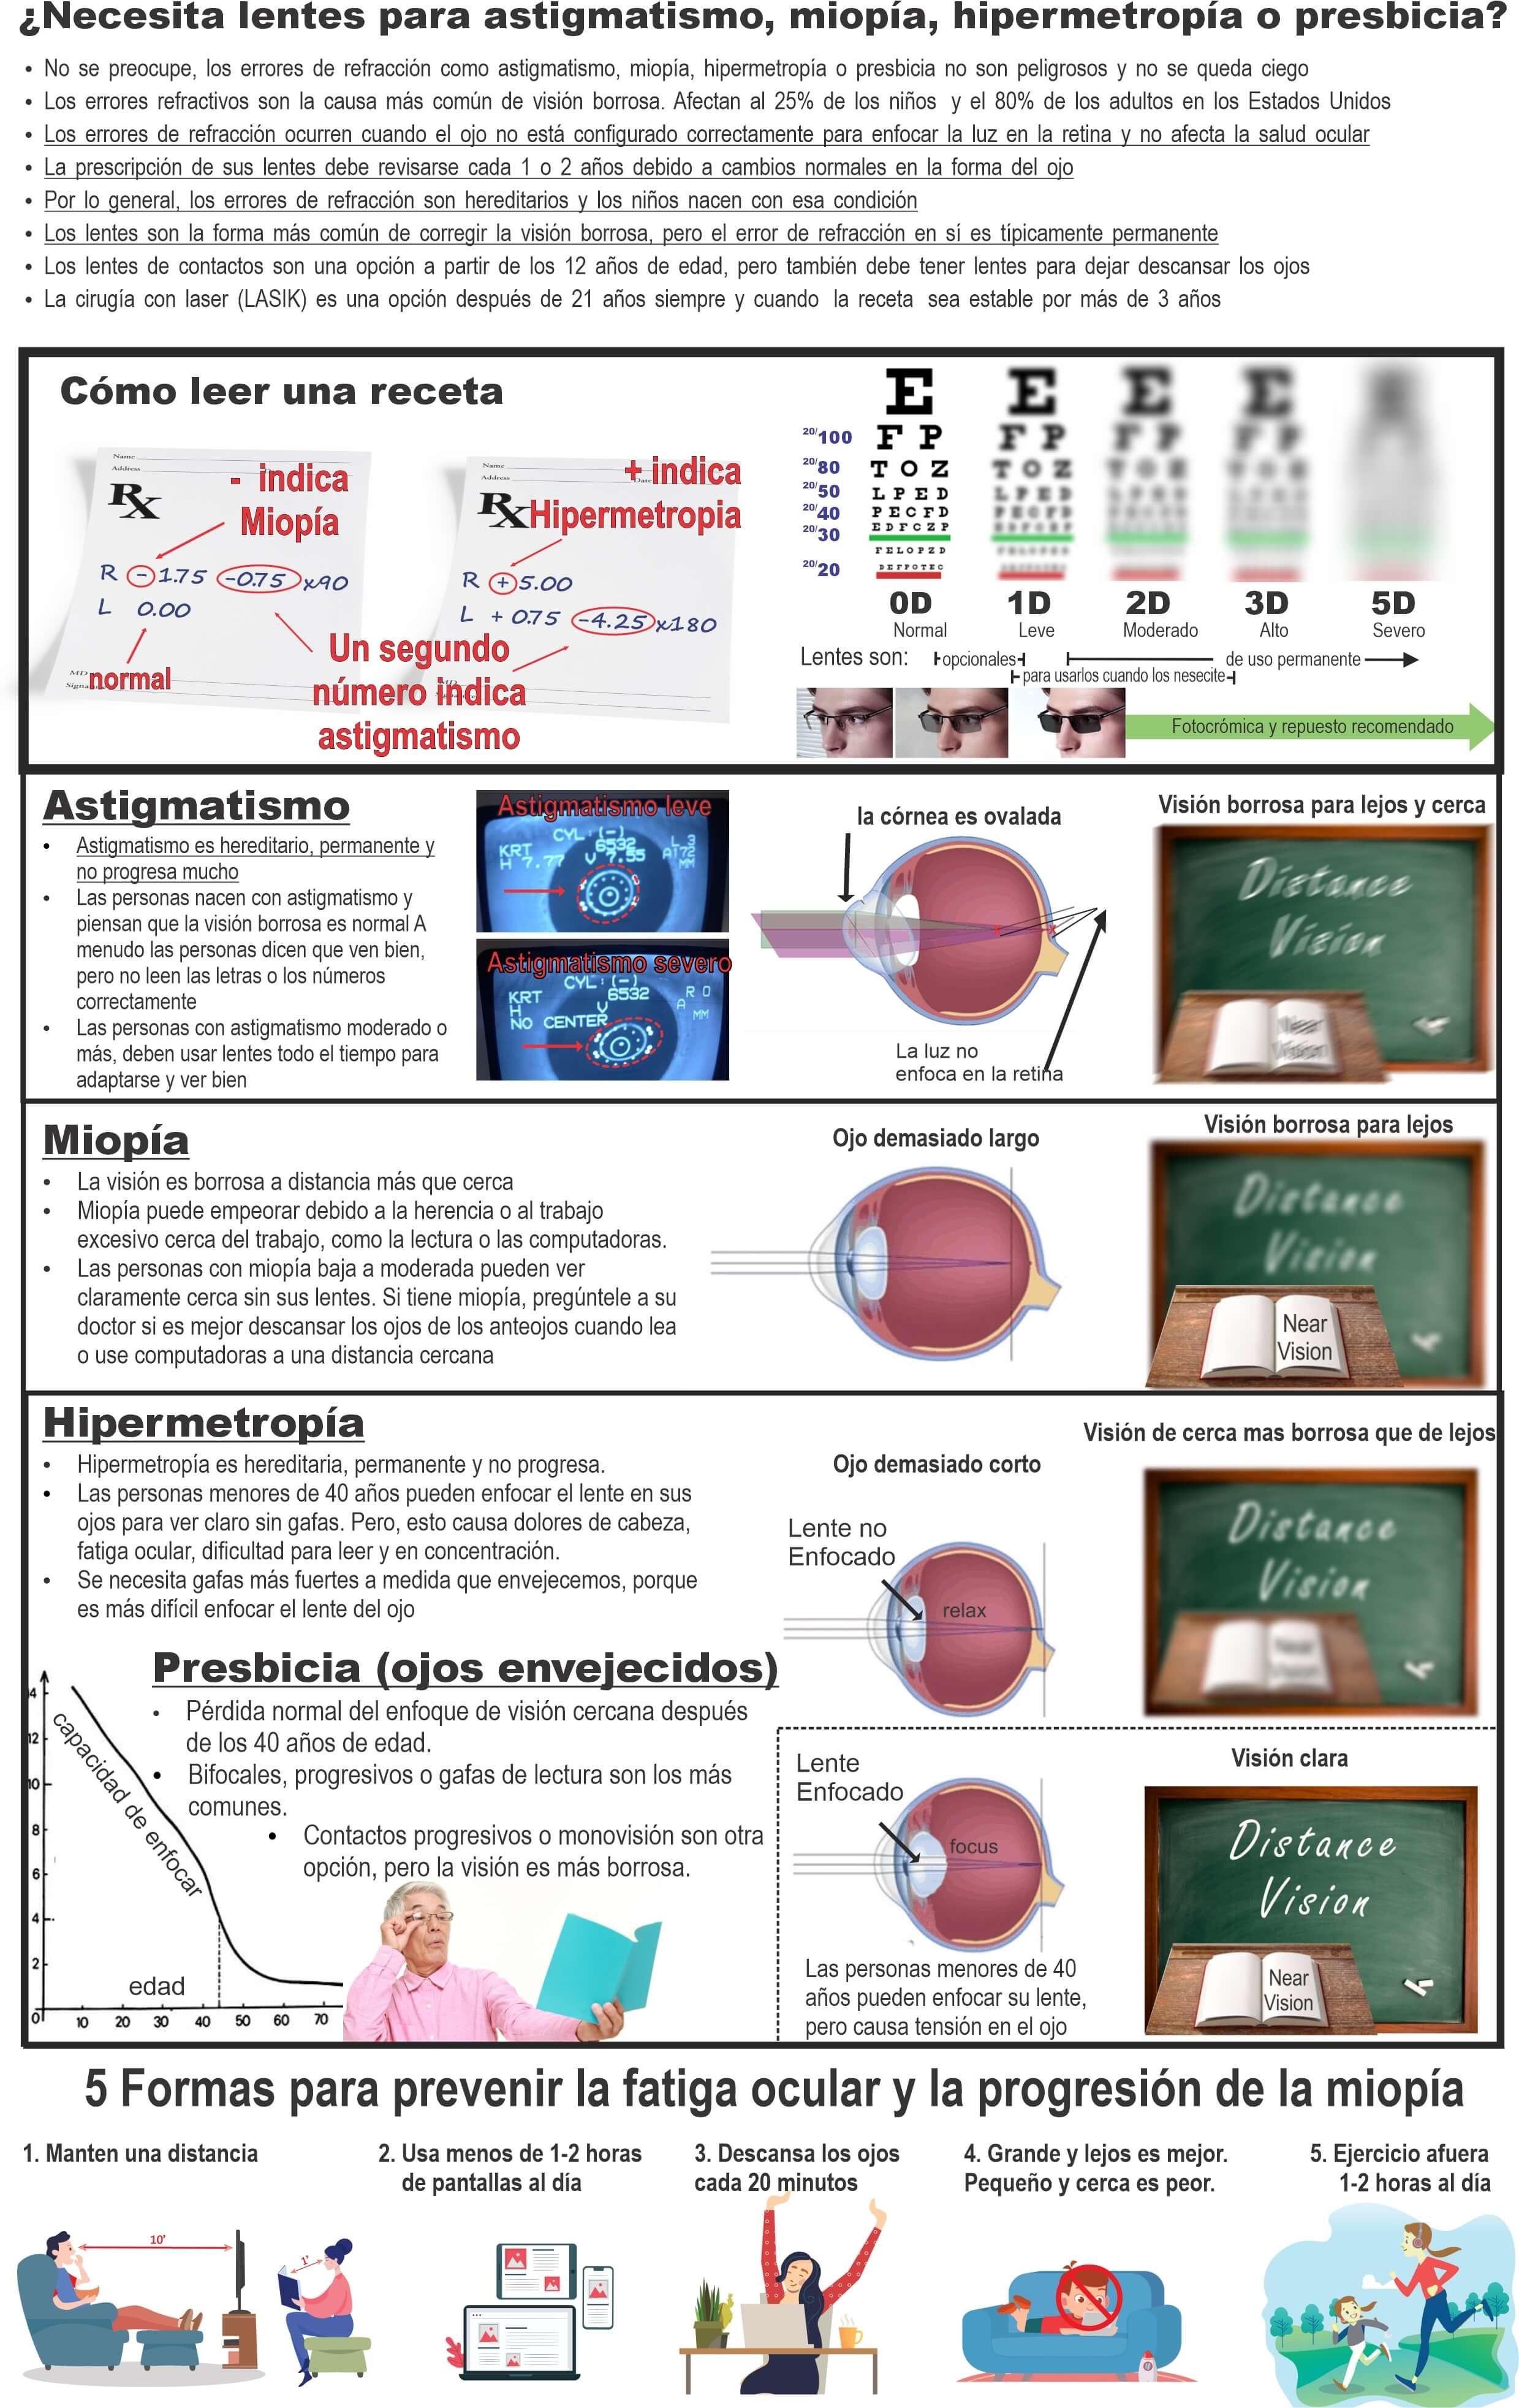 NeedGlassesForRefractive Errors, PRESBYOPIA SP